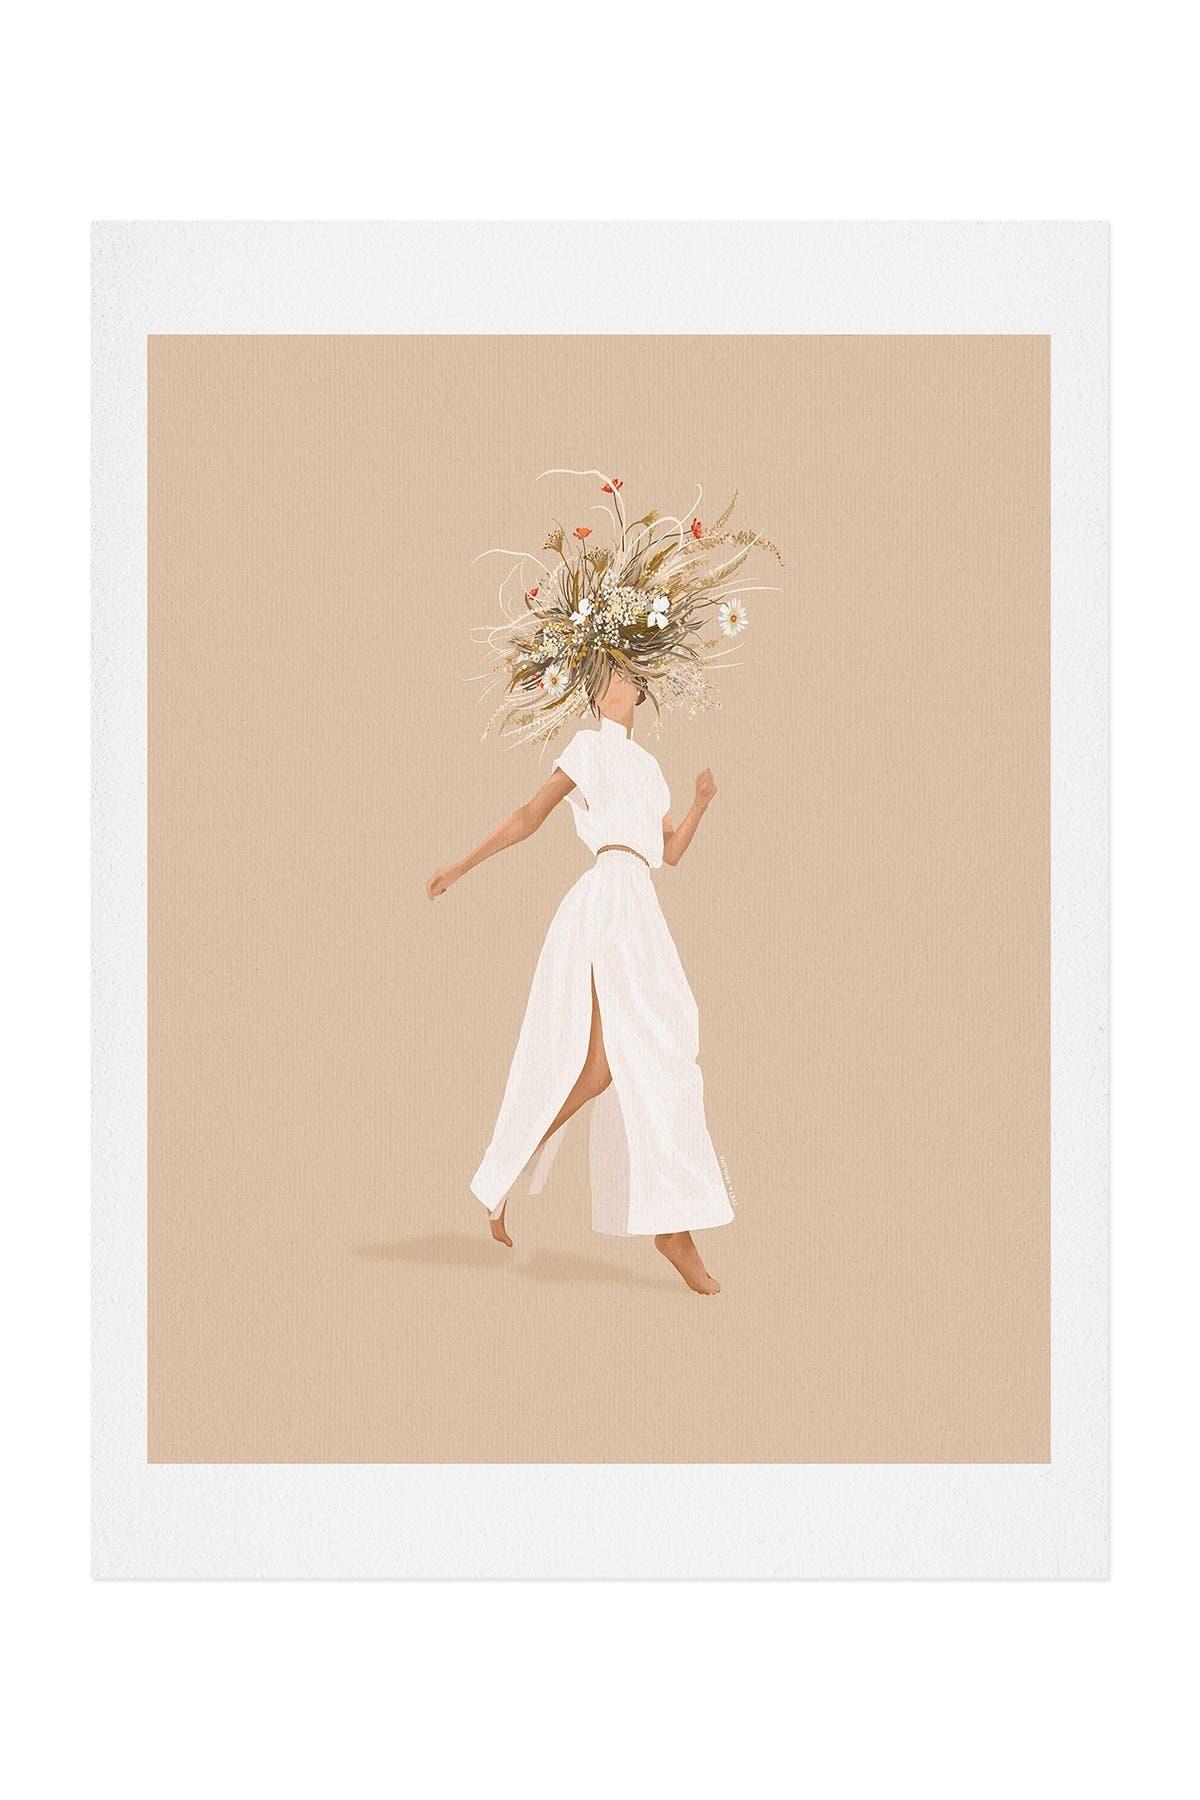 Image of Deny Designs Iveta Abolina Estelle Flora Art Print